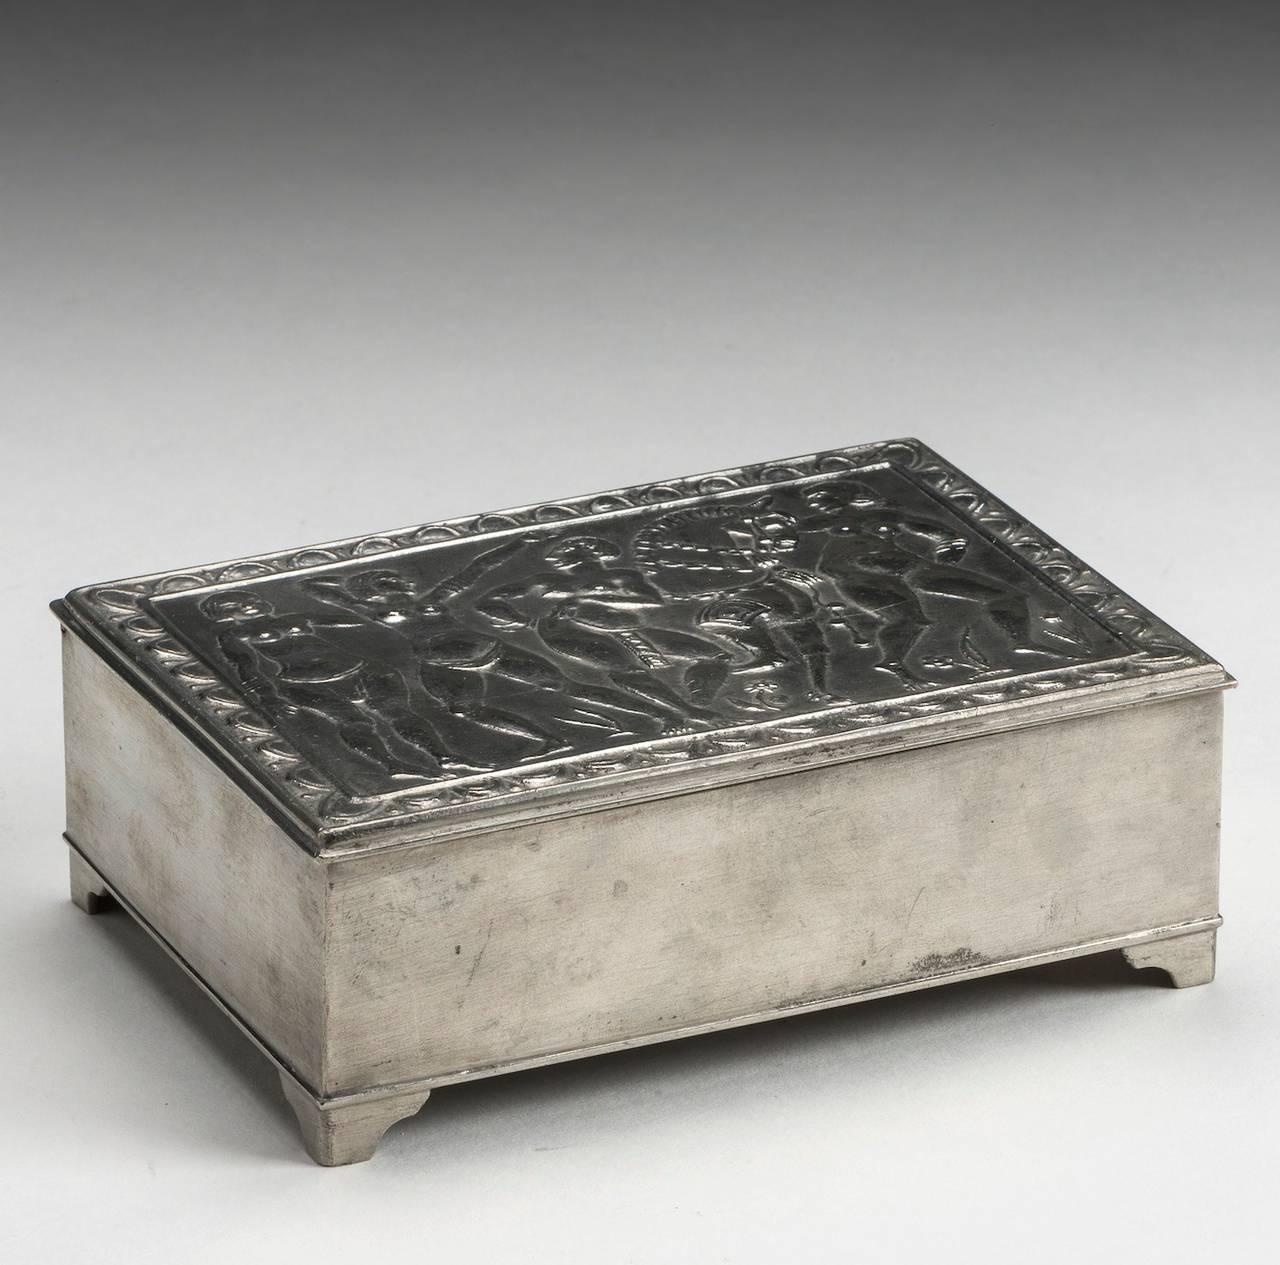 Estrid Ericson Svenskt Tenn Pewter Box With Lid, Sweden 1928 2